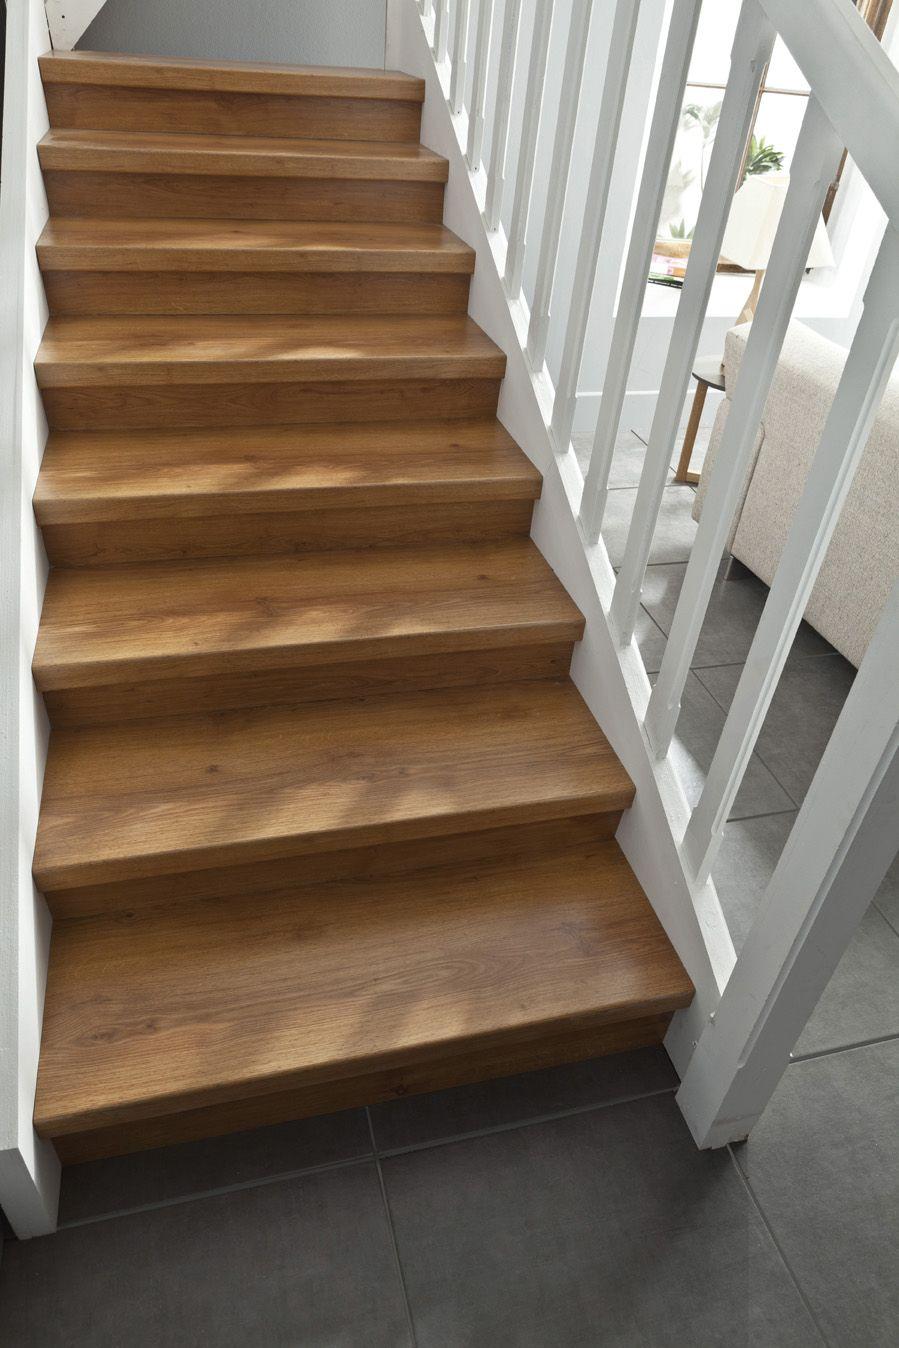 Kit De Renovation Escalier Stratifie Chene Saint Maclou Escalier Escalier Stratifie Saint Maclou